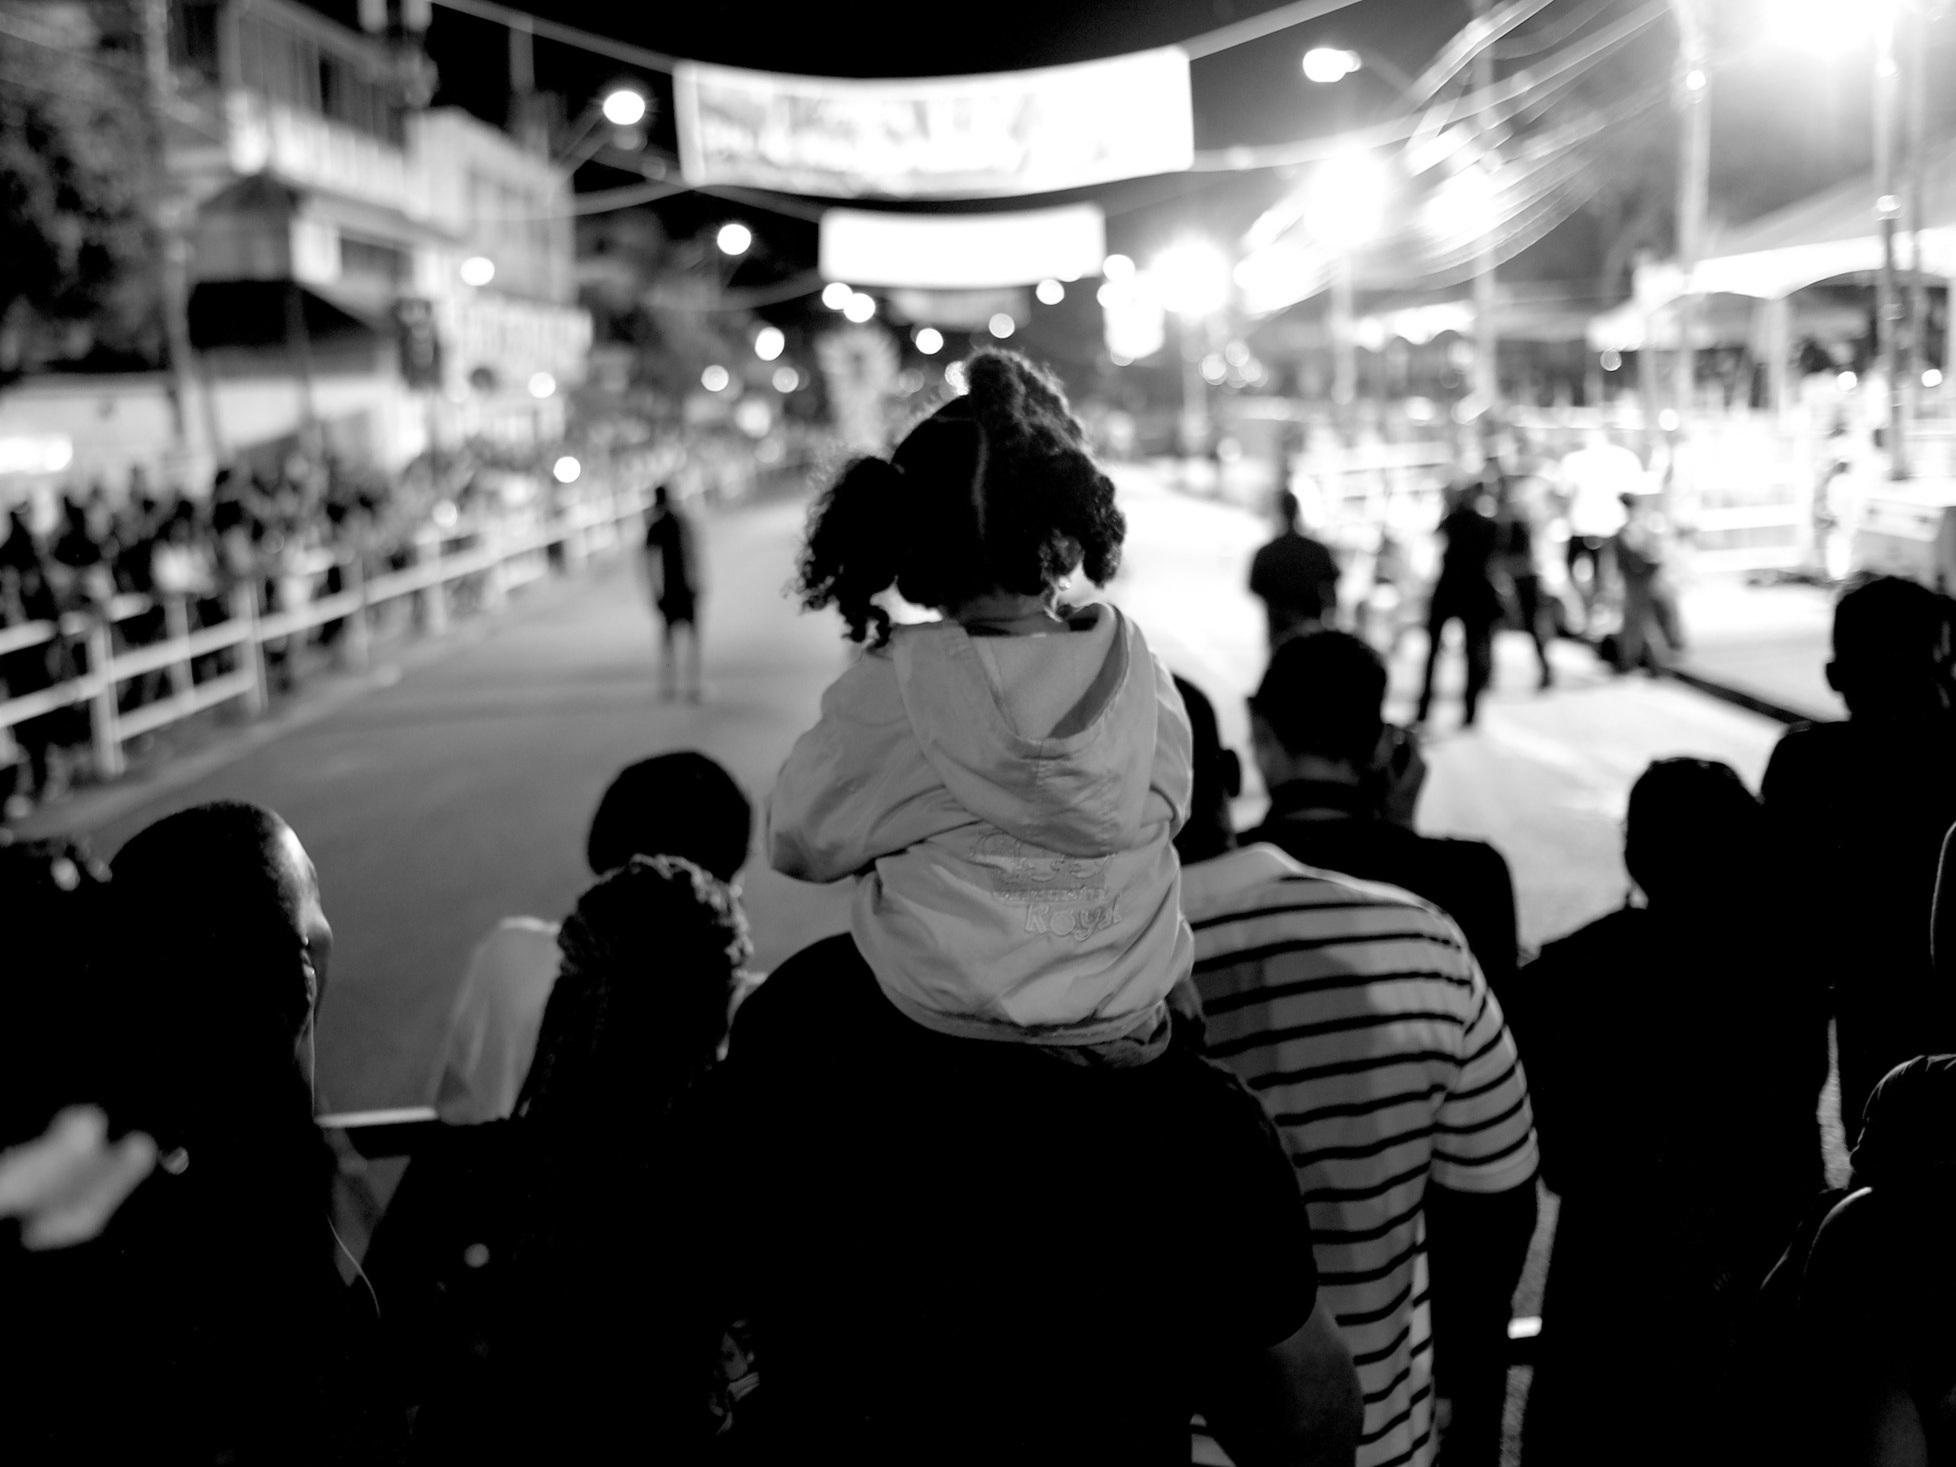 Child On Shoulders, Adam Smith Square, Trinidad 2019.